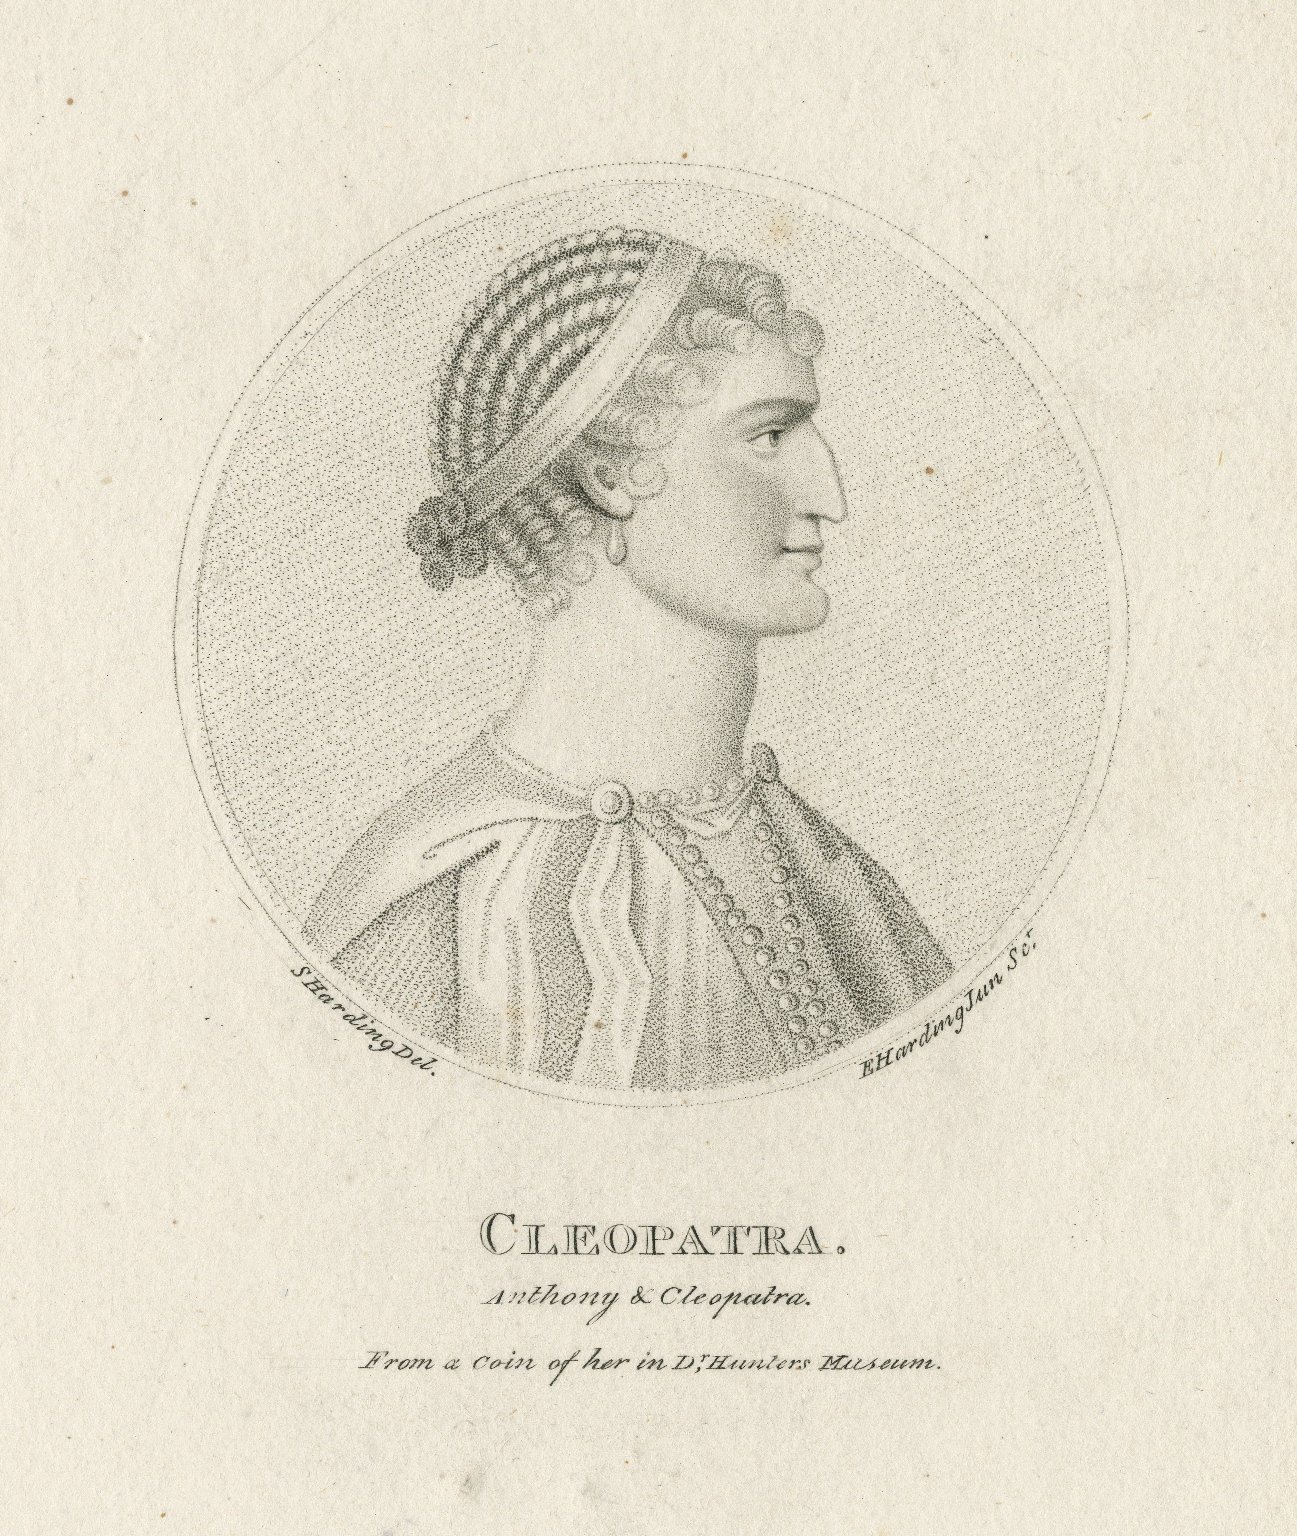 Cleopatra [character in Shakespeare's Anthony & Cleopatra]... [graphic] / S. Harding del. ; E. Harding Jun. sc.